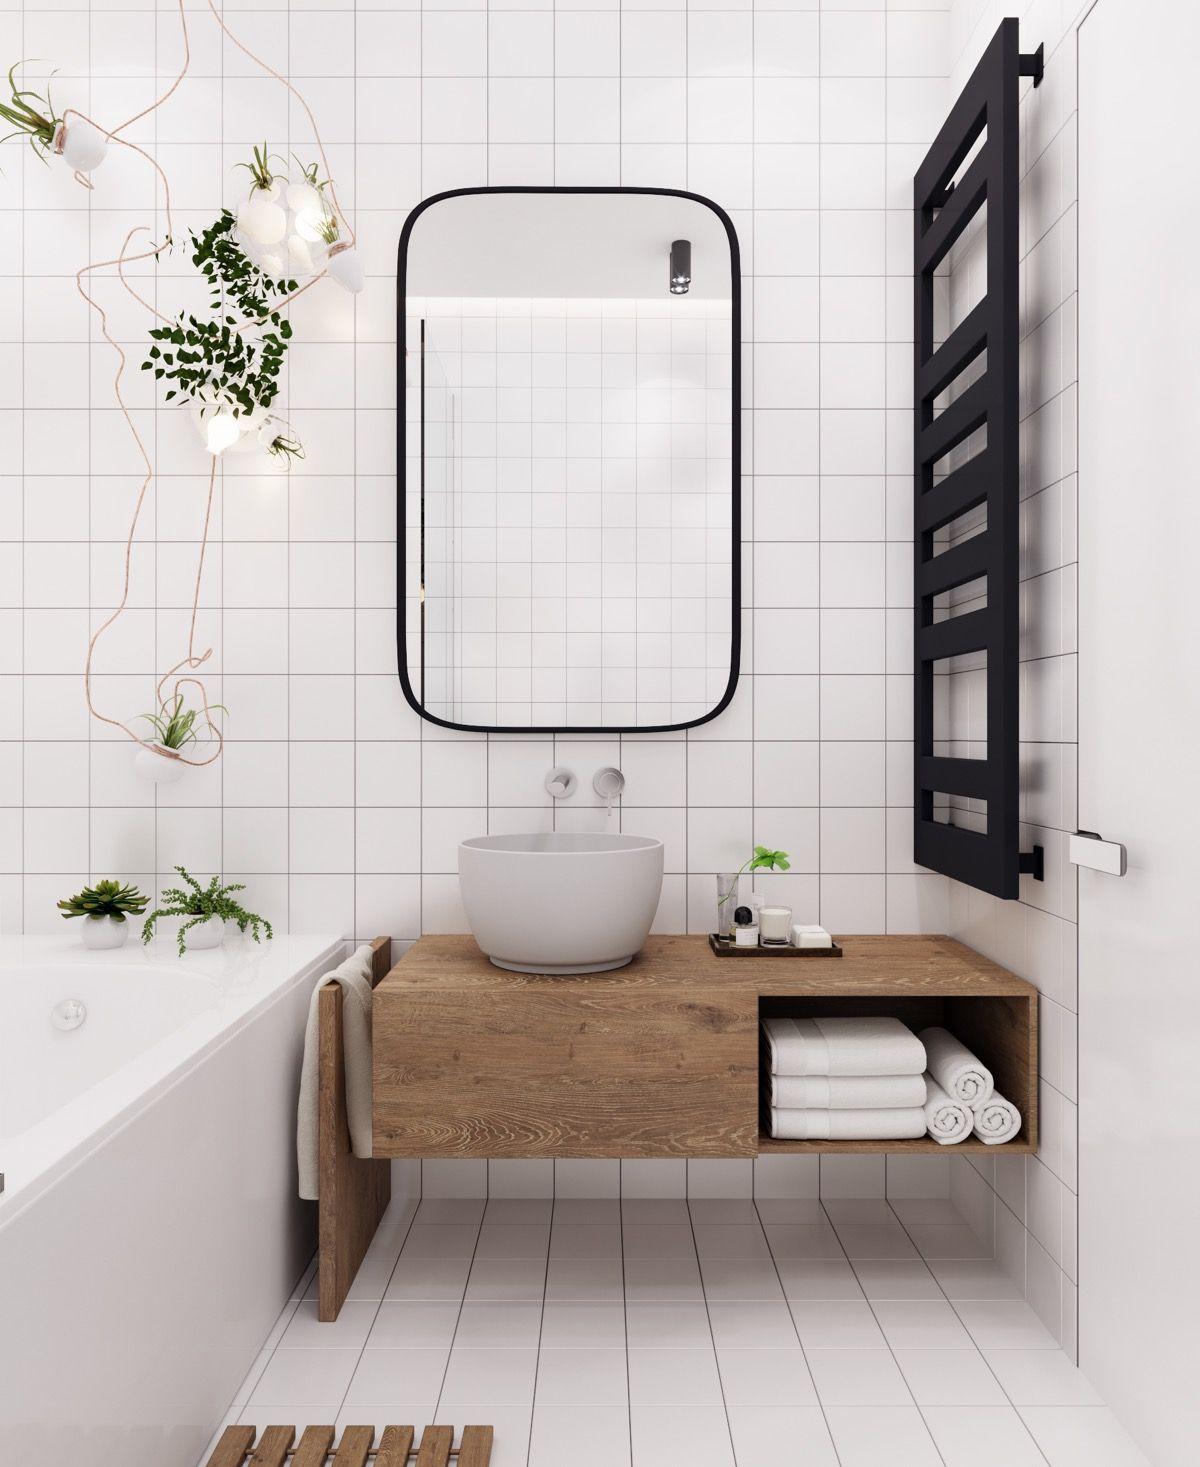 5 Gorgeous Scandinavian Bathroom Ideas: 40 Modern Bathroom Vanities That Overflow With Style